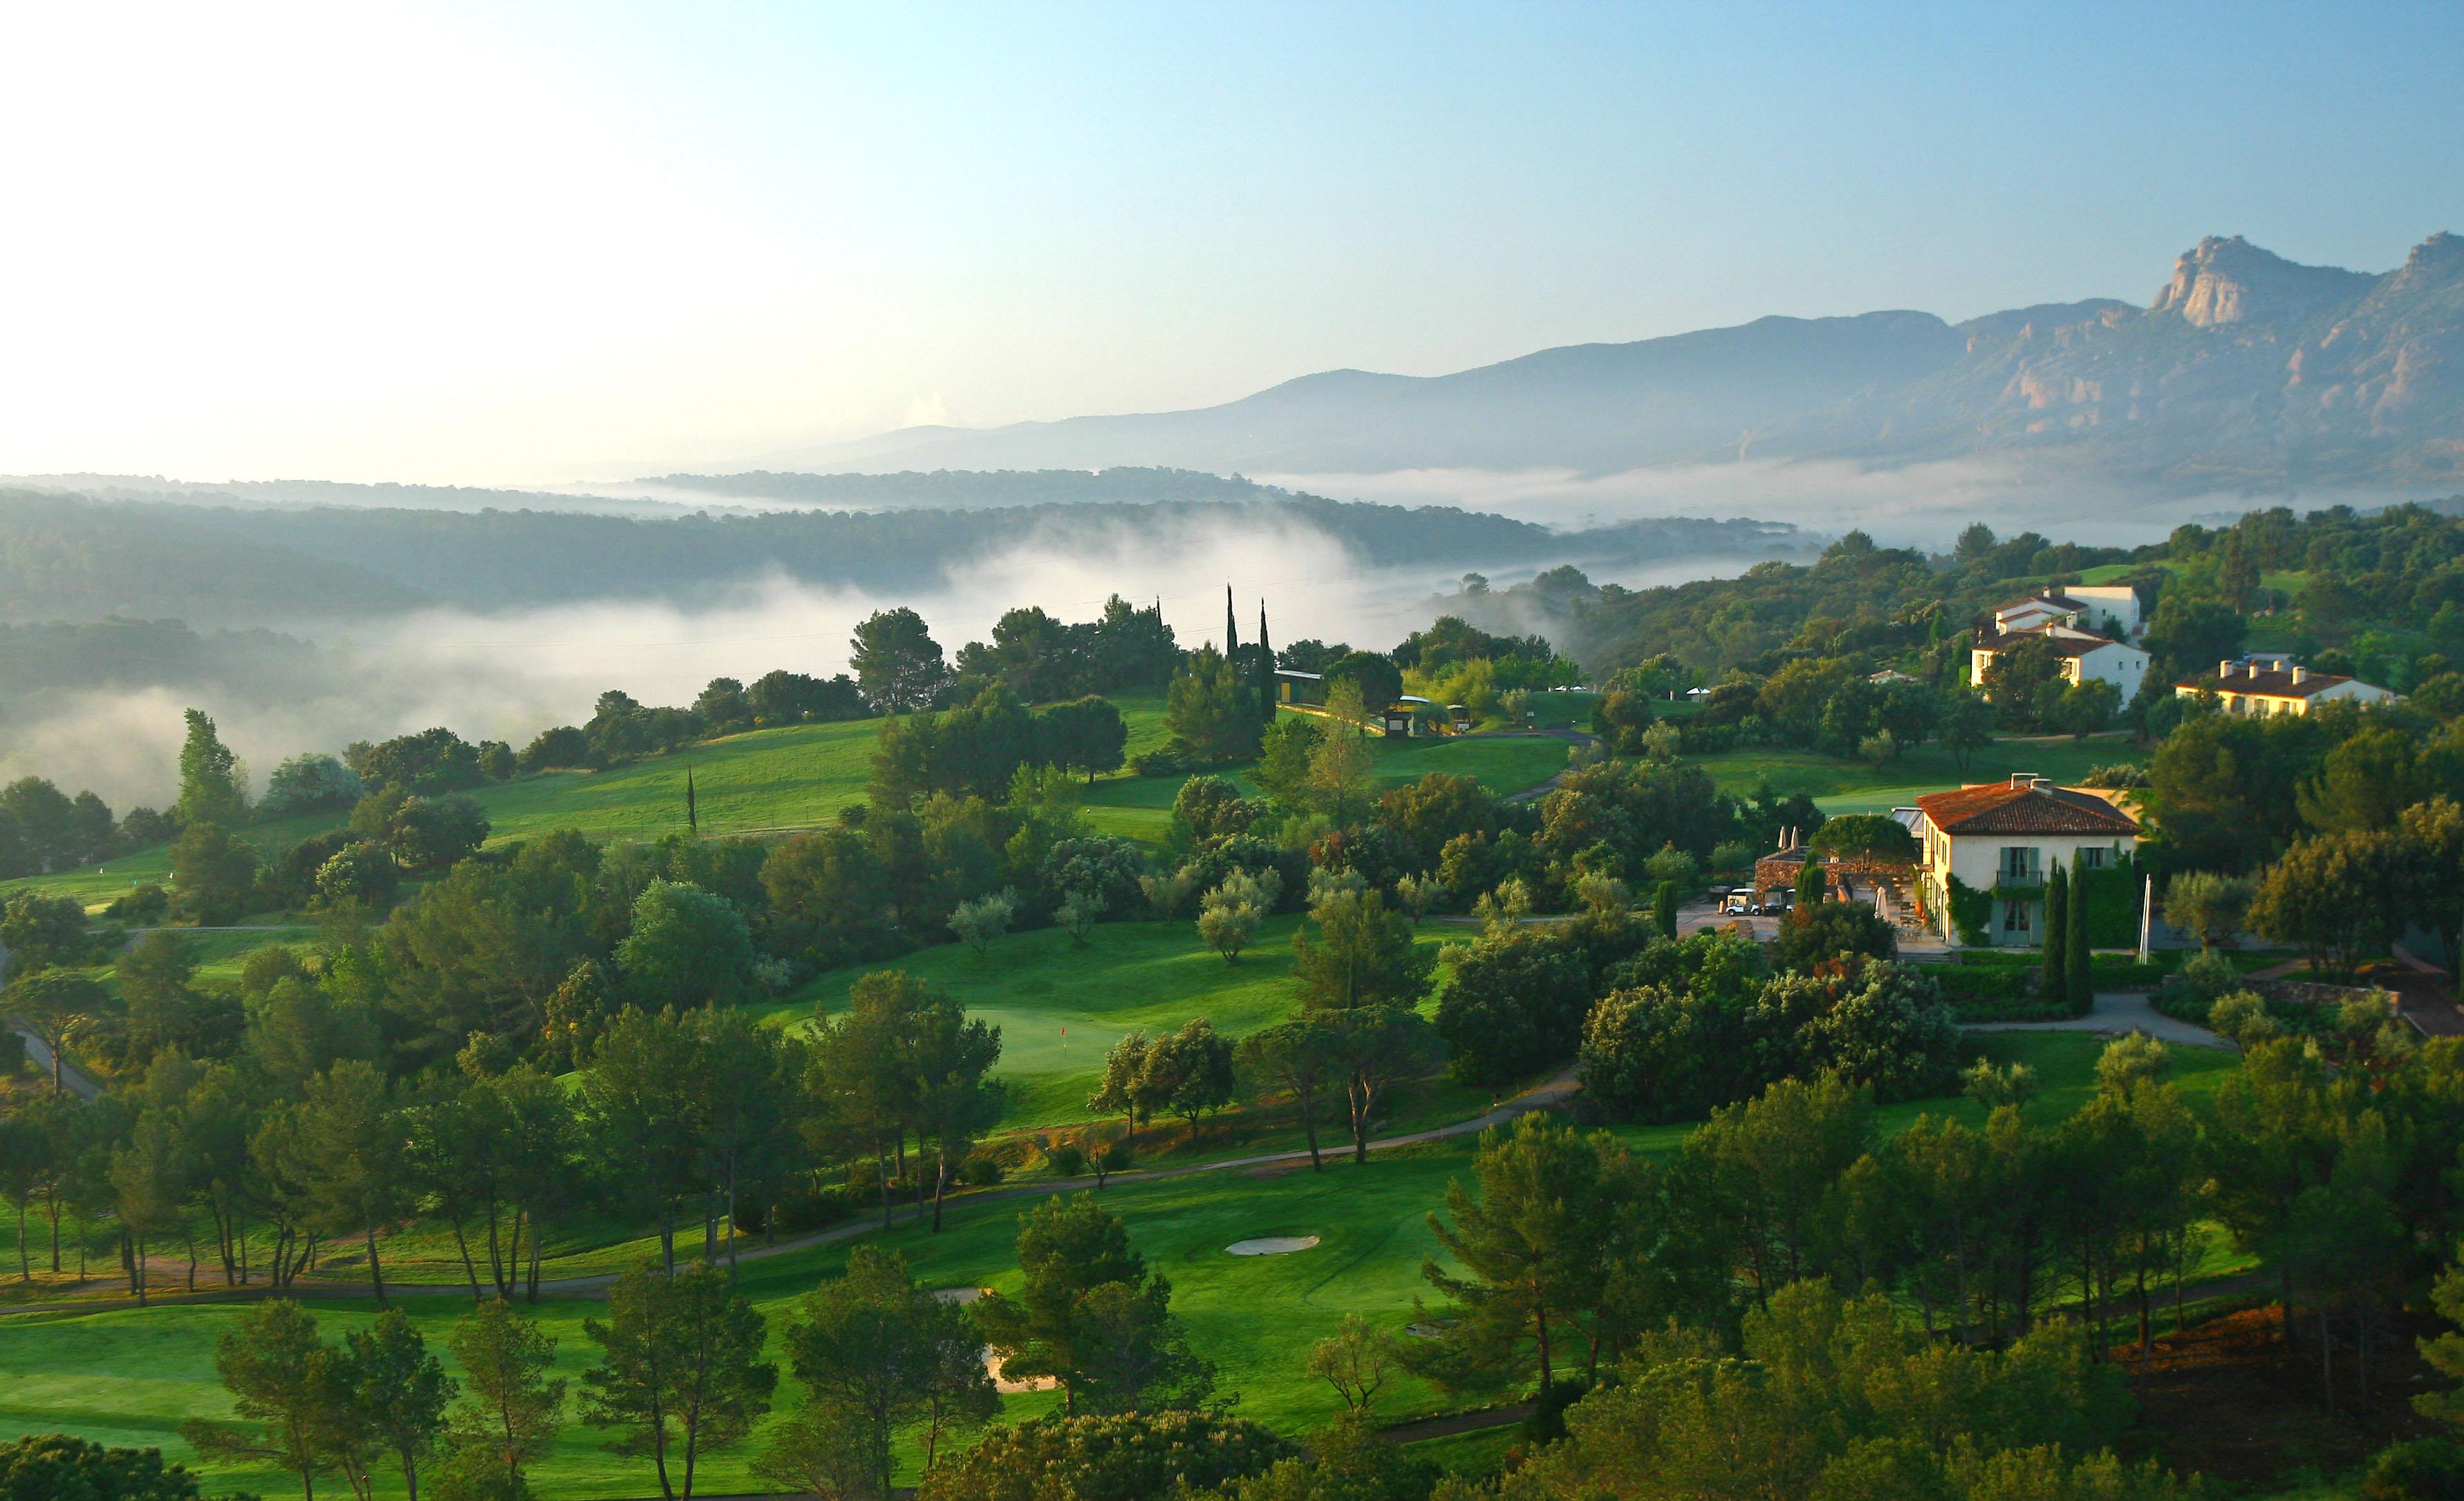 golf-expedition-golf-reizen-frankrijk-regio-cote-d'azur-Les-Domaines-de-Saint-Endréol-Golf-en-Spa-Resort-bovenaanzicht-accommodatie-villa-en-golfbanen